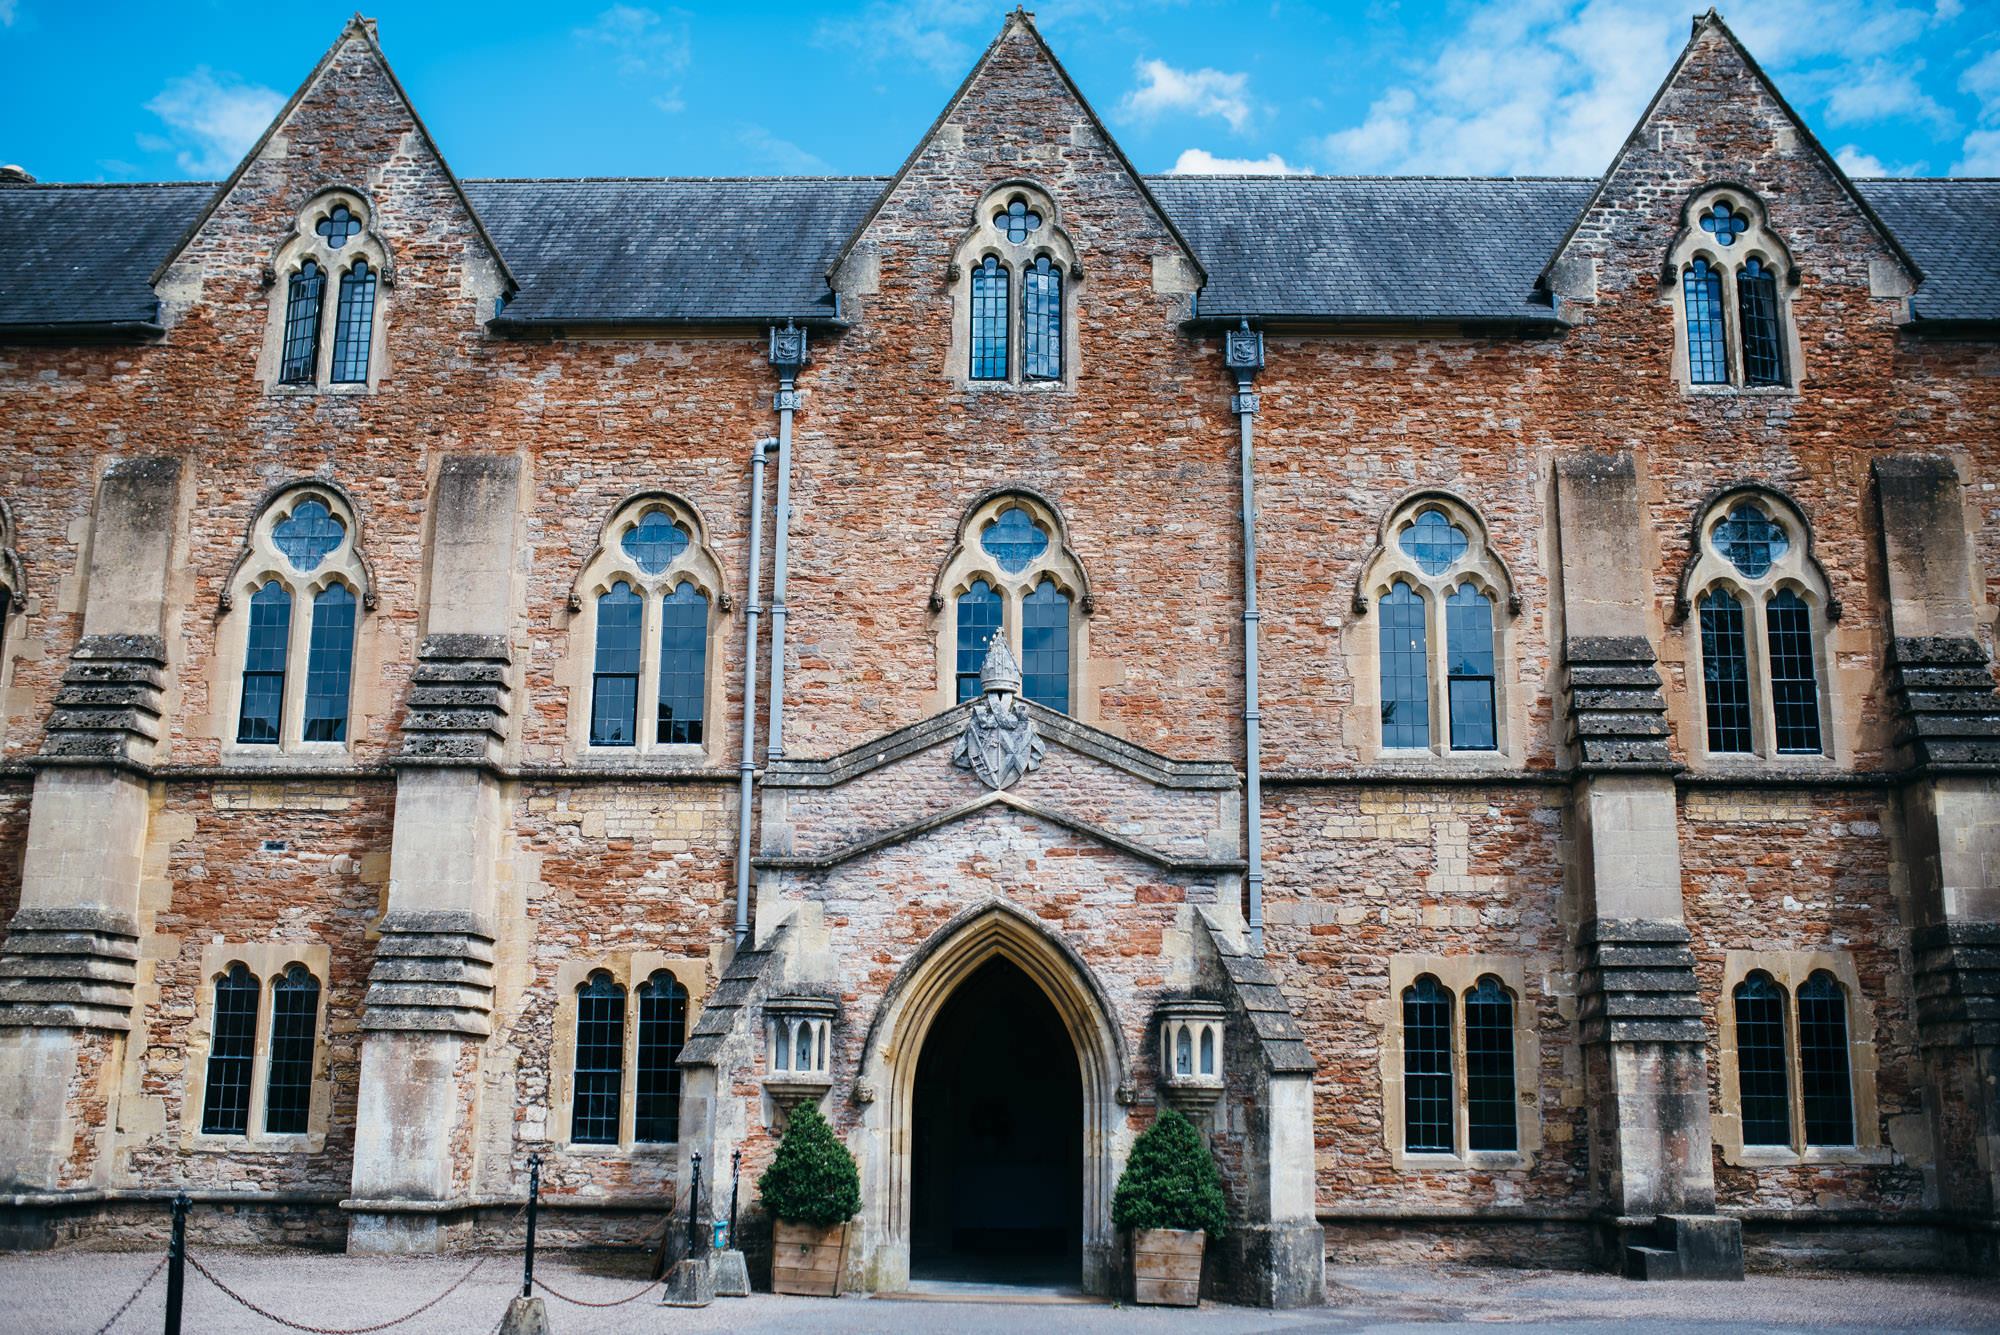 Bishops palace wedding venue